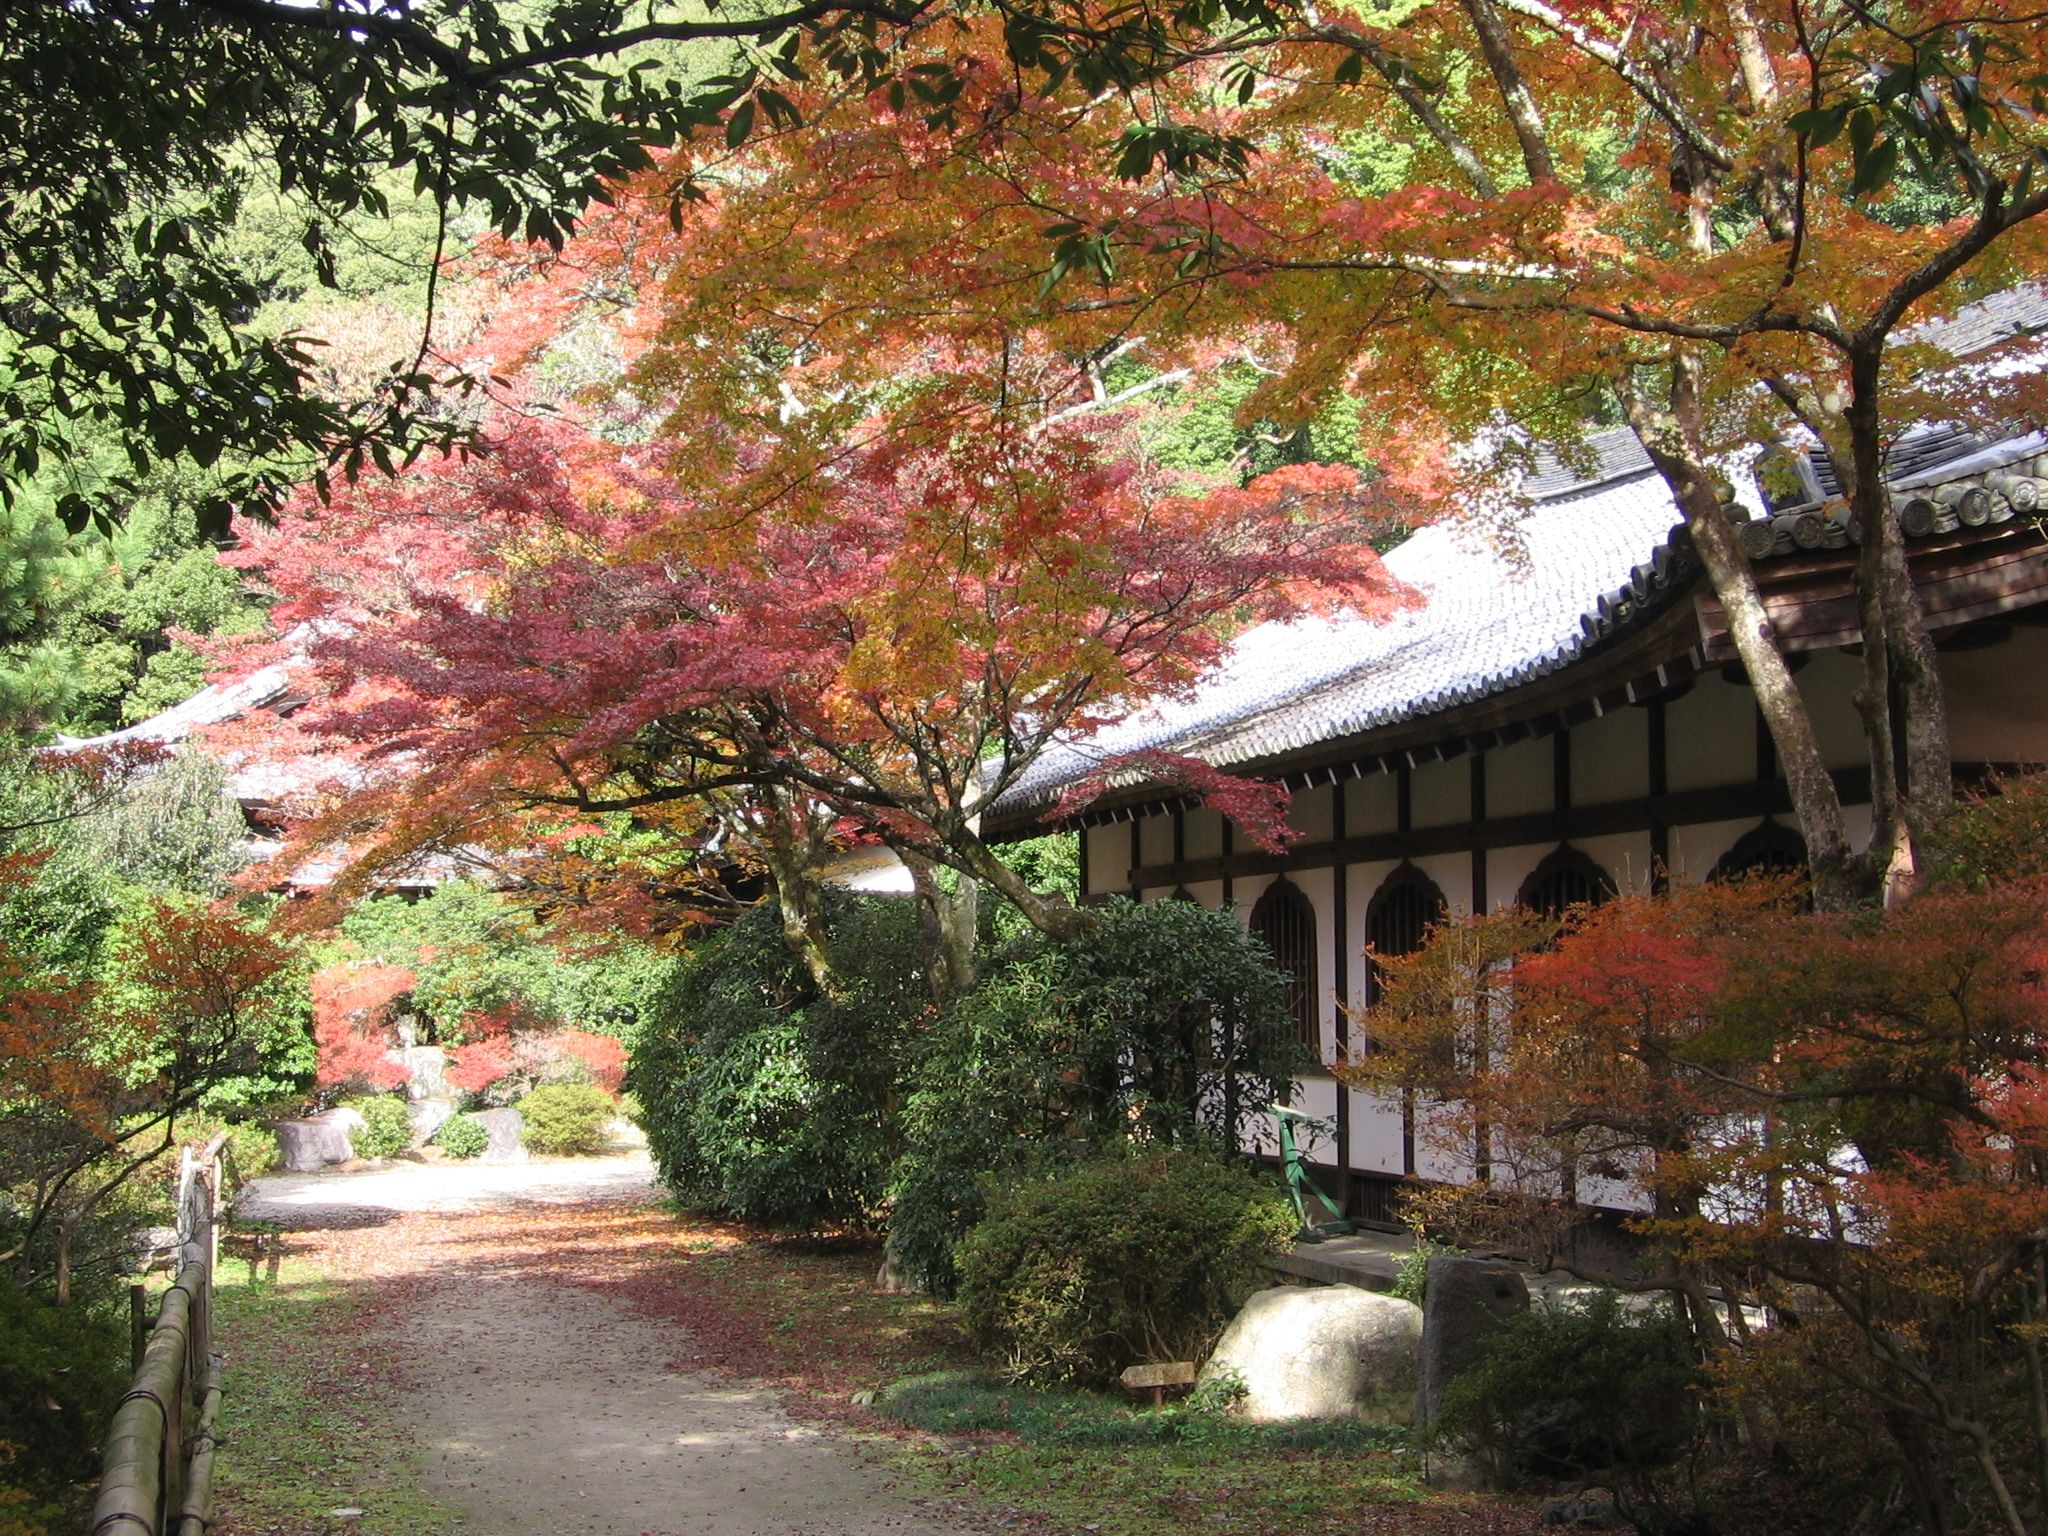 japanese landscape - samurai Photo (14636843) - Fanpop  |Beautiful Japanese Landscapes